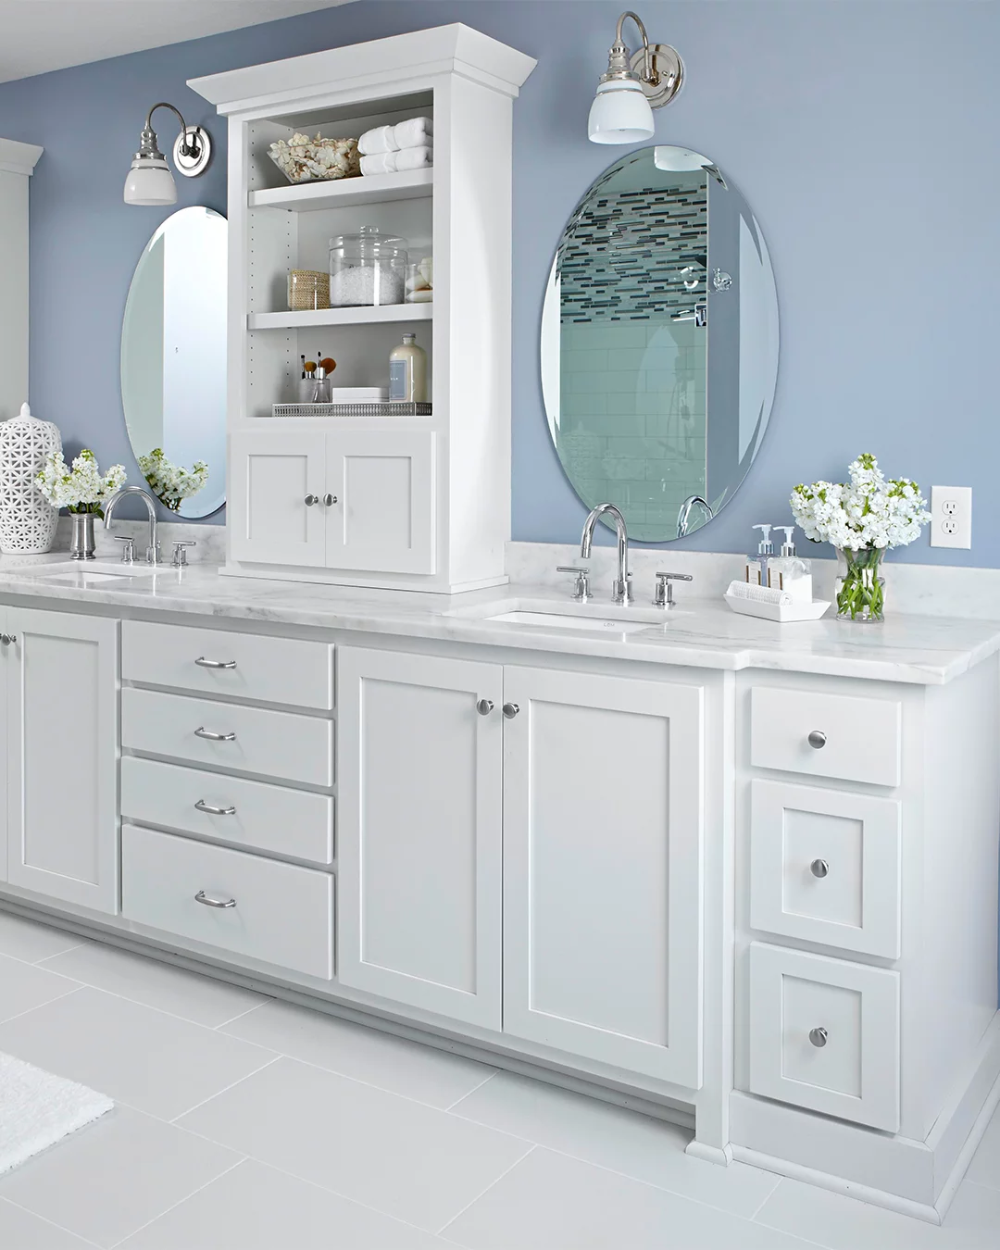 12 Popular Bathroom Paint Colors Our Editors Swear By In 2020 Best Bathroom Paint Colors Blue Bathroom Blue Bathroom Paint